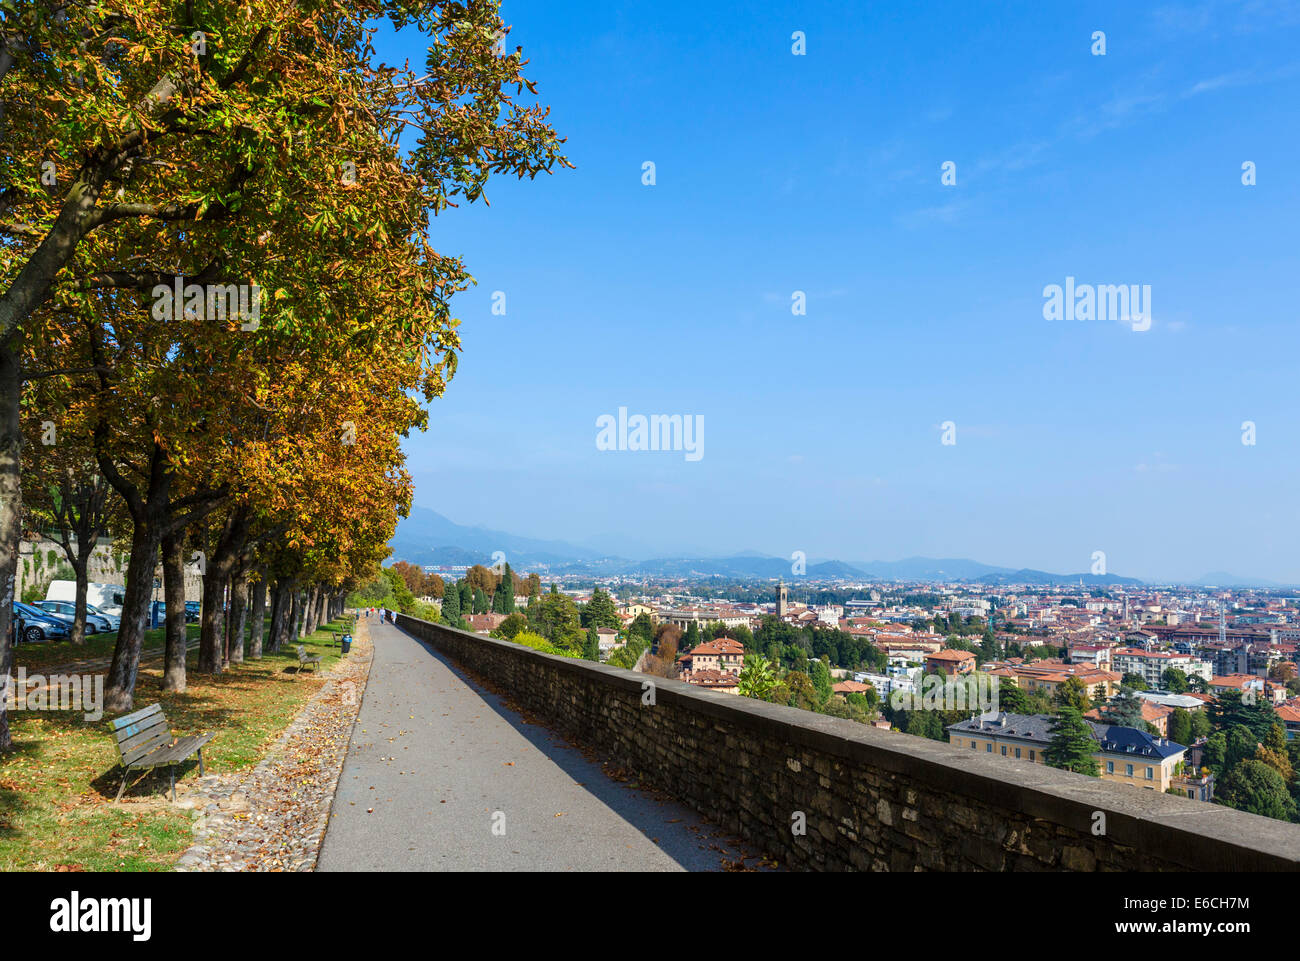 View over Bergamo Bassa from the path along the walls around Bergamo Alta, Lombardy, Italy Stock Photo